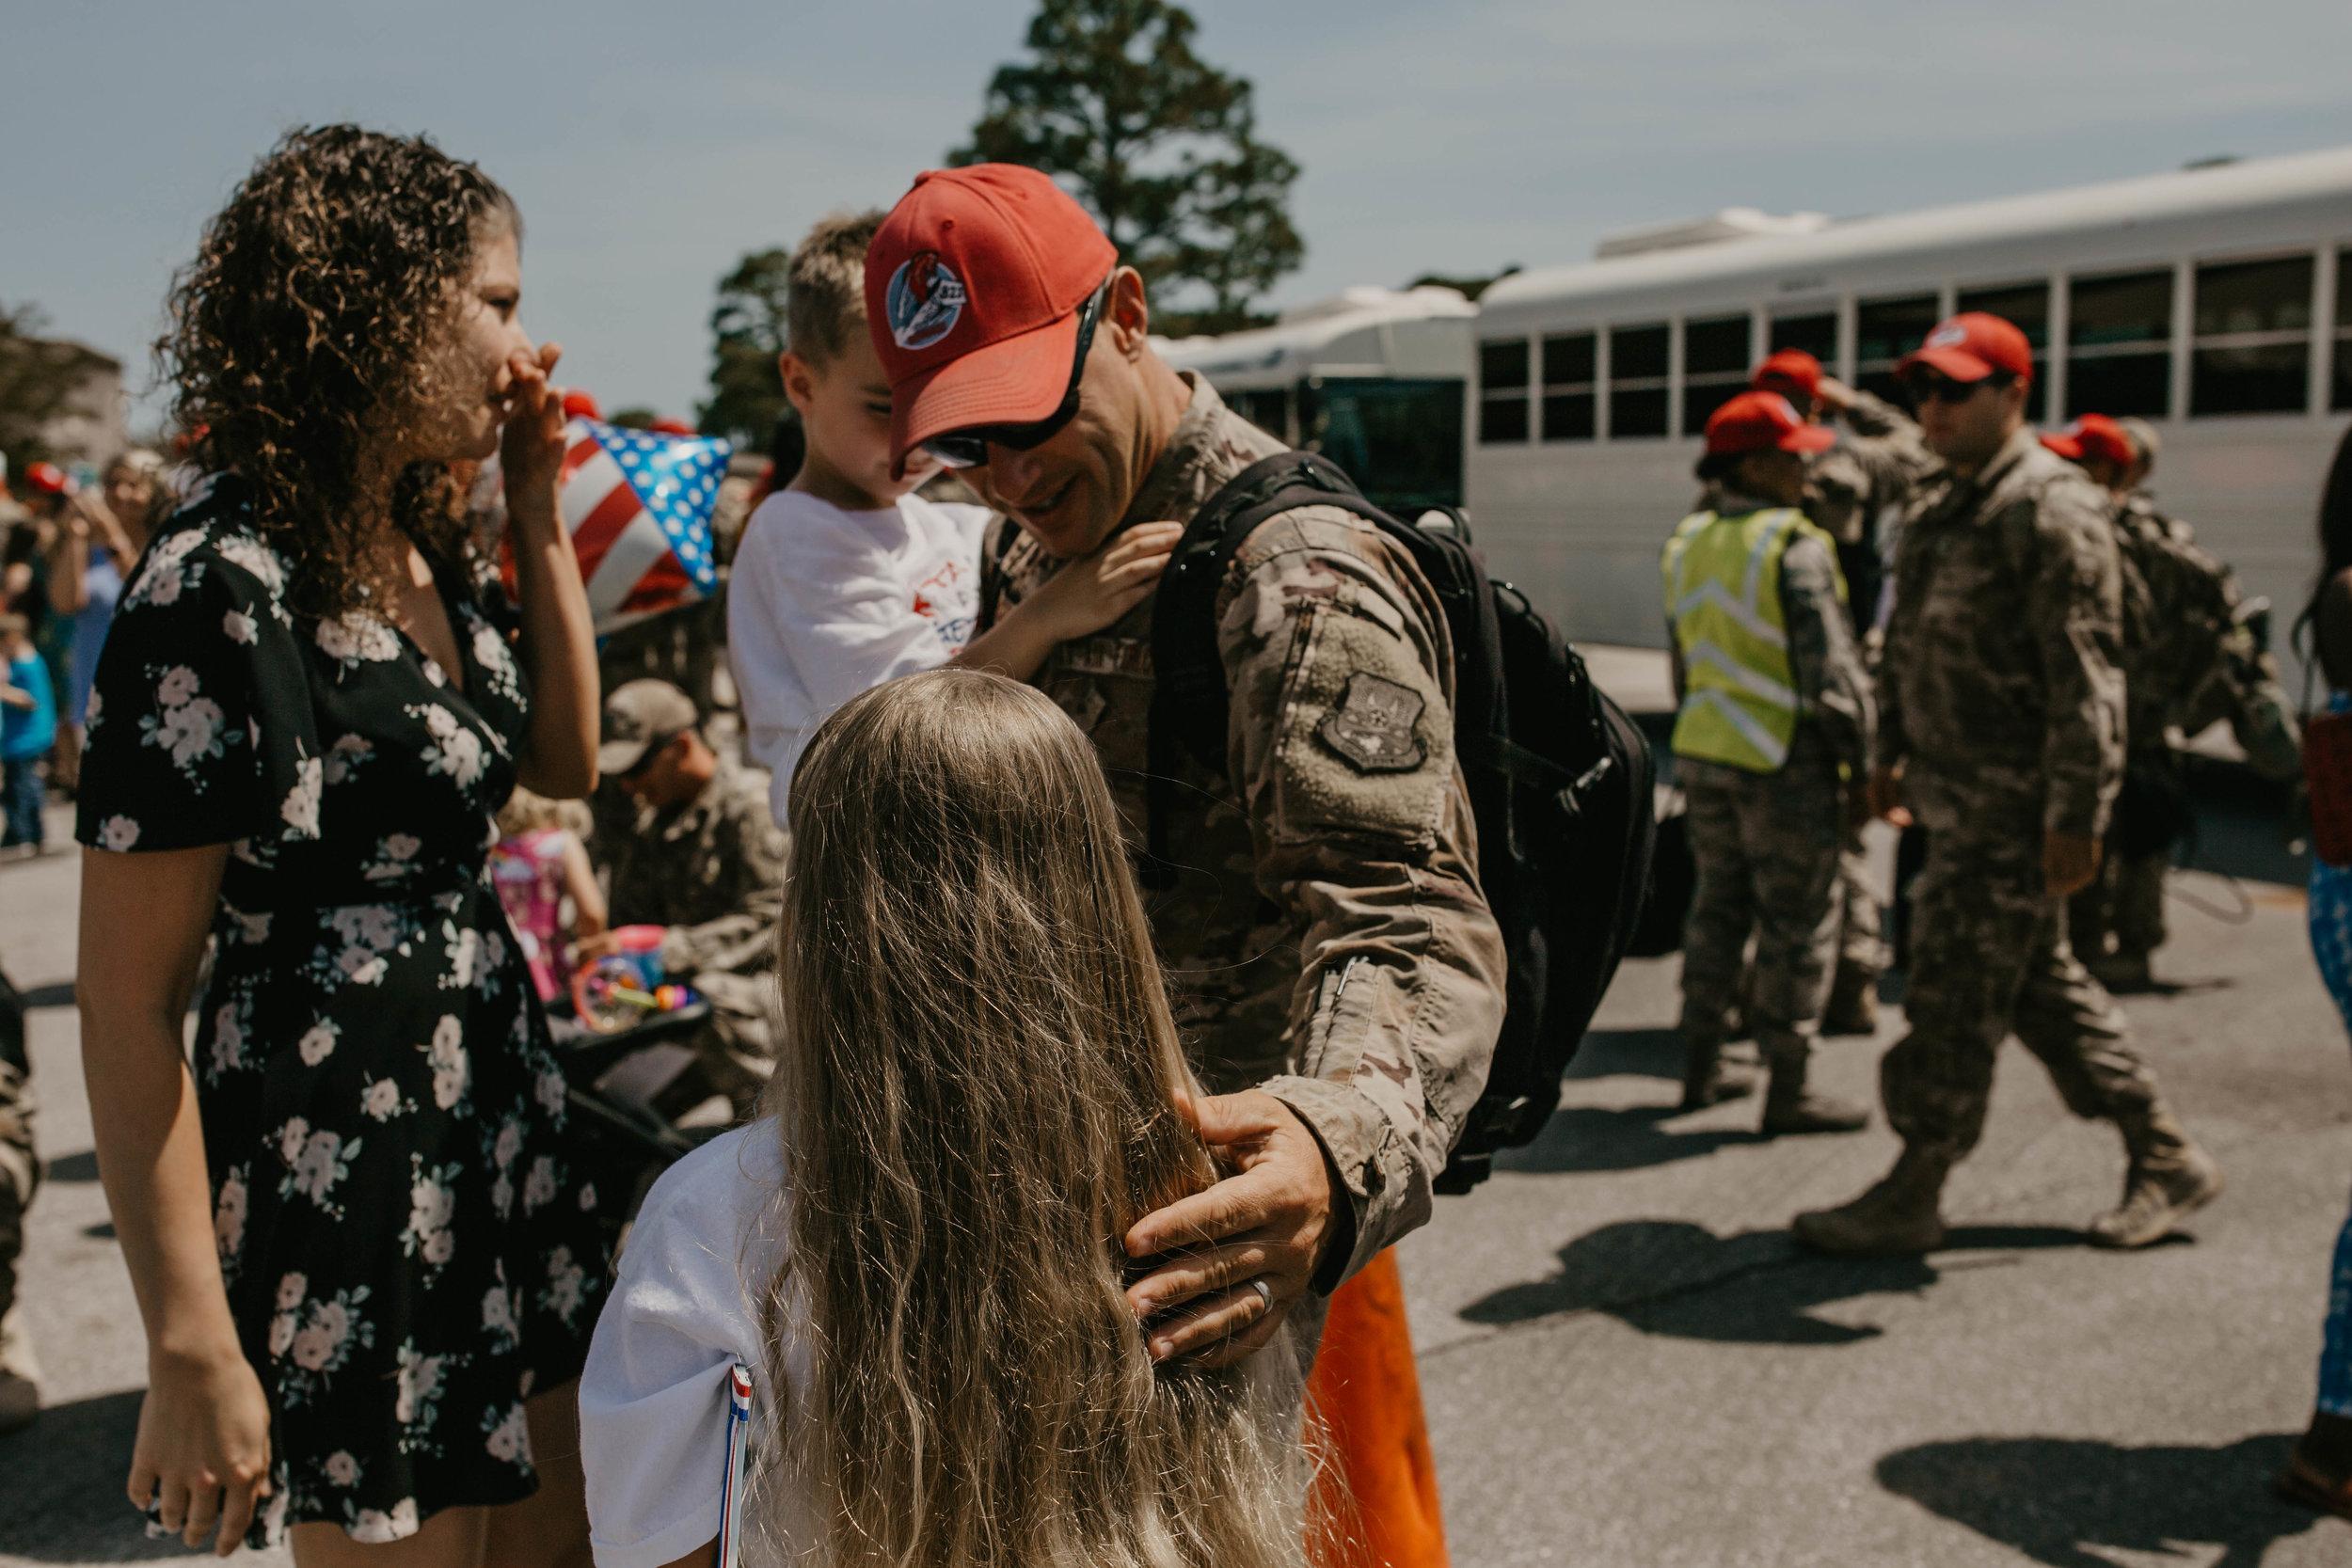 Military deployment reunion